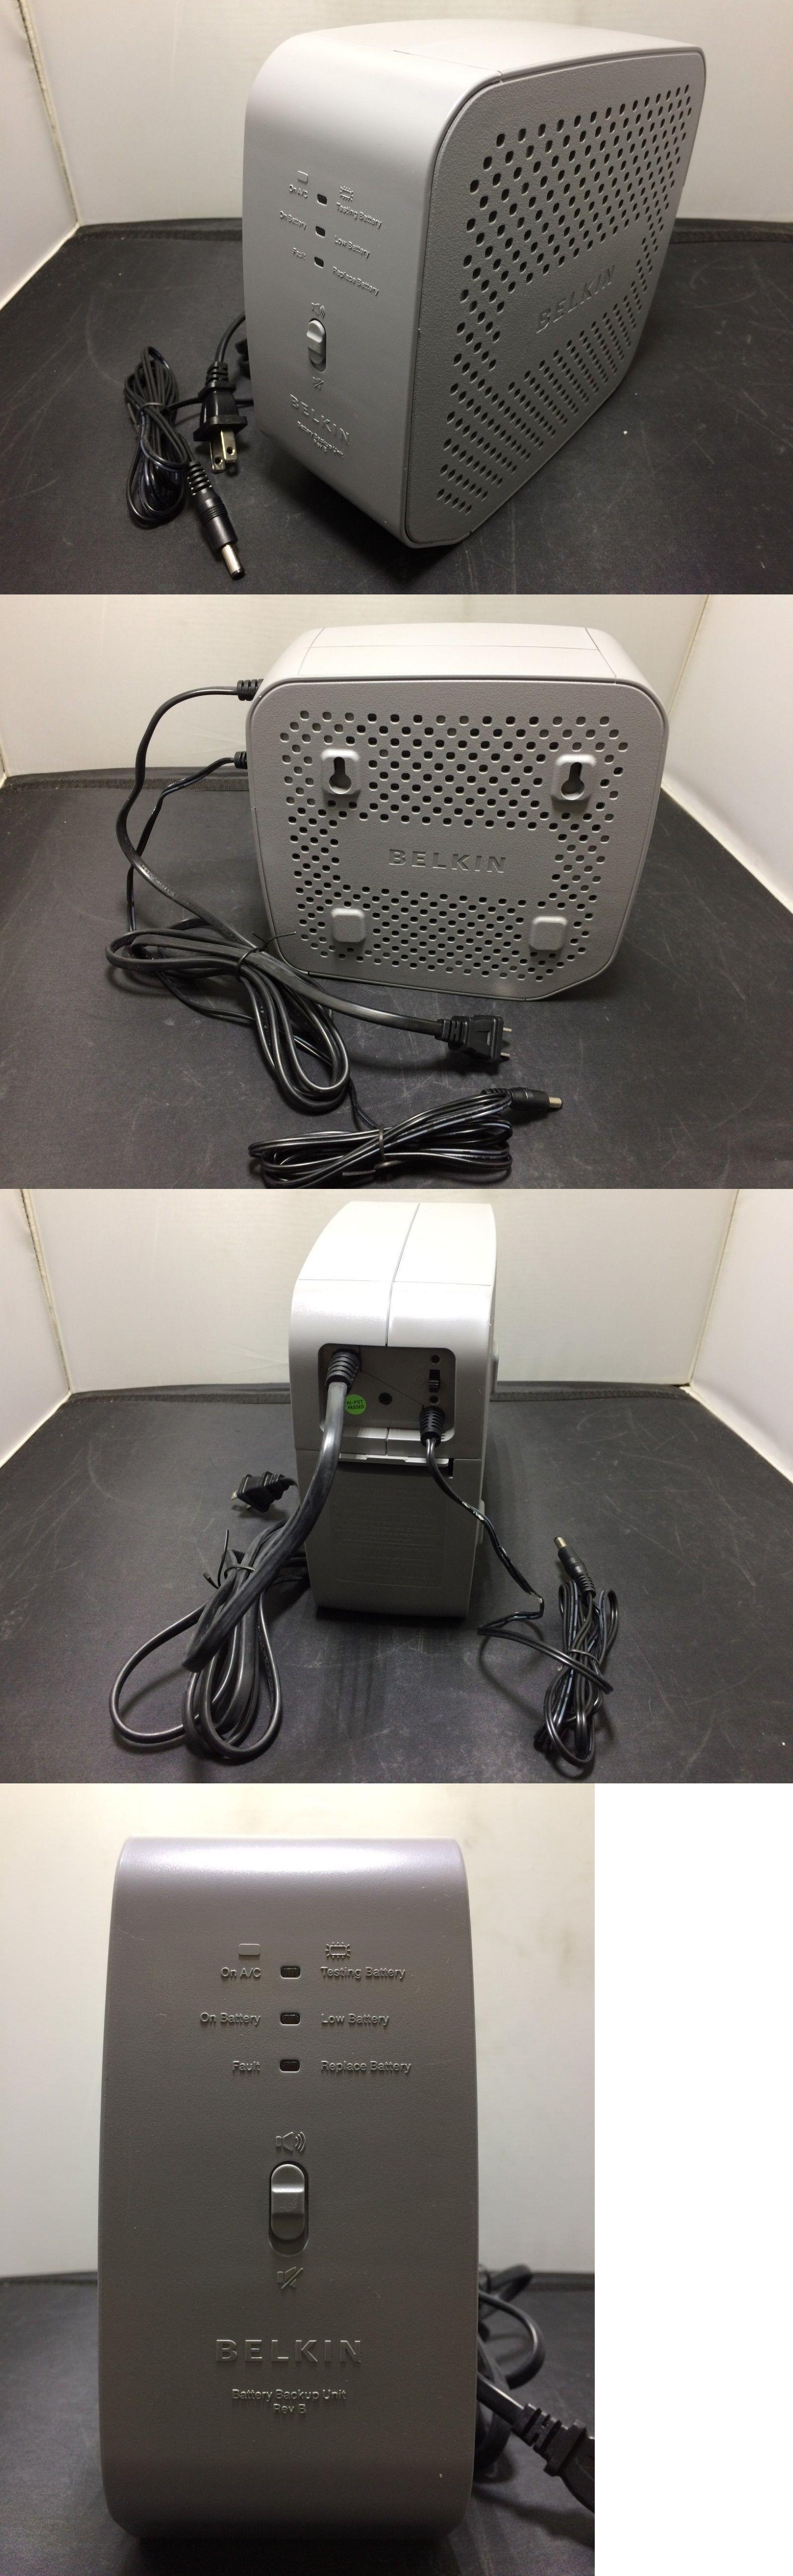 Uninterruptible Power Supplies 99265 Belkin Residential Gateway Rg Battery Backup Rev B 12v Dc Ups Bu3dc0 Battery Backup Belkin Uninterruptible Power Supplies